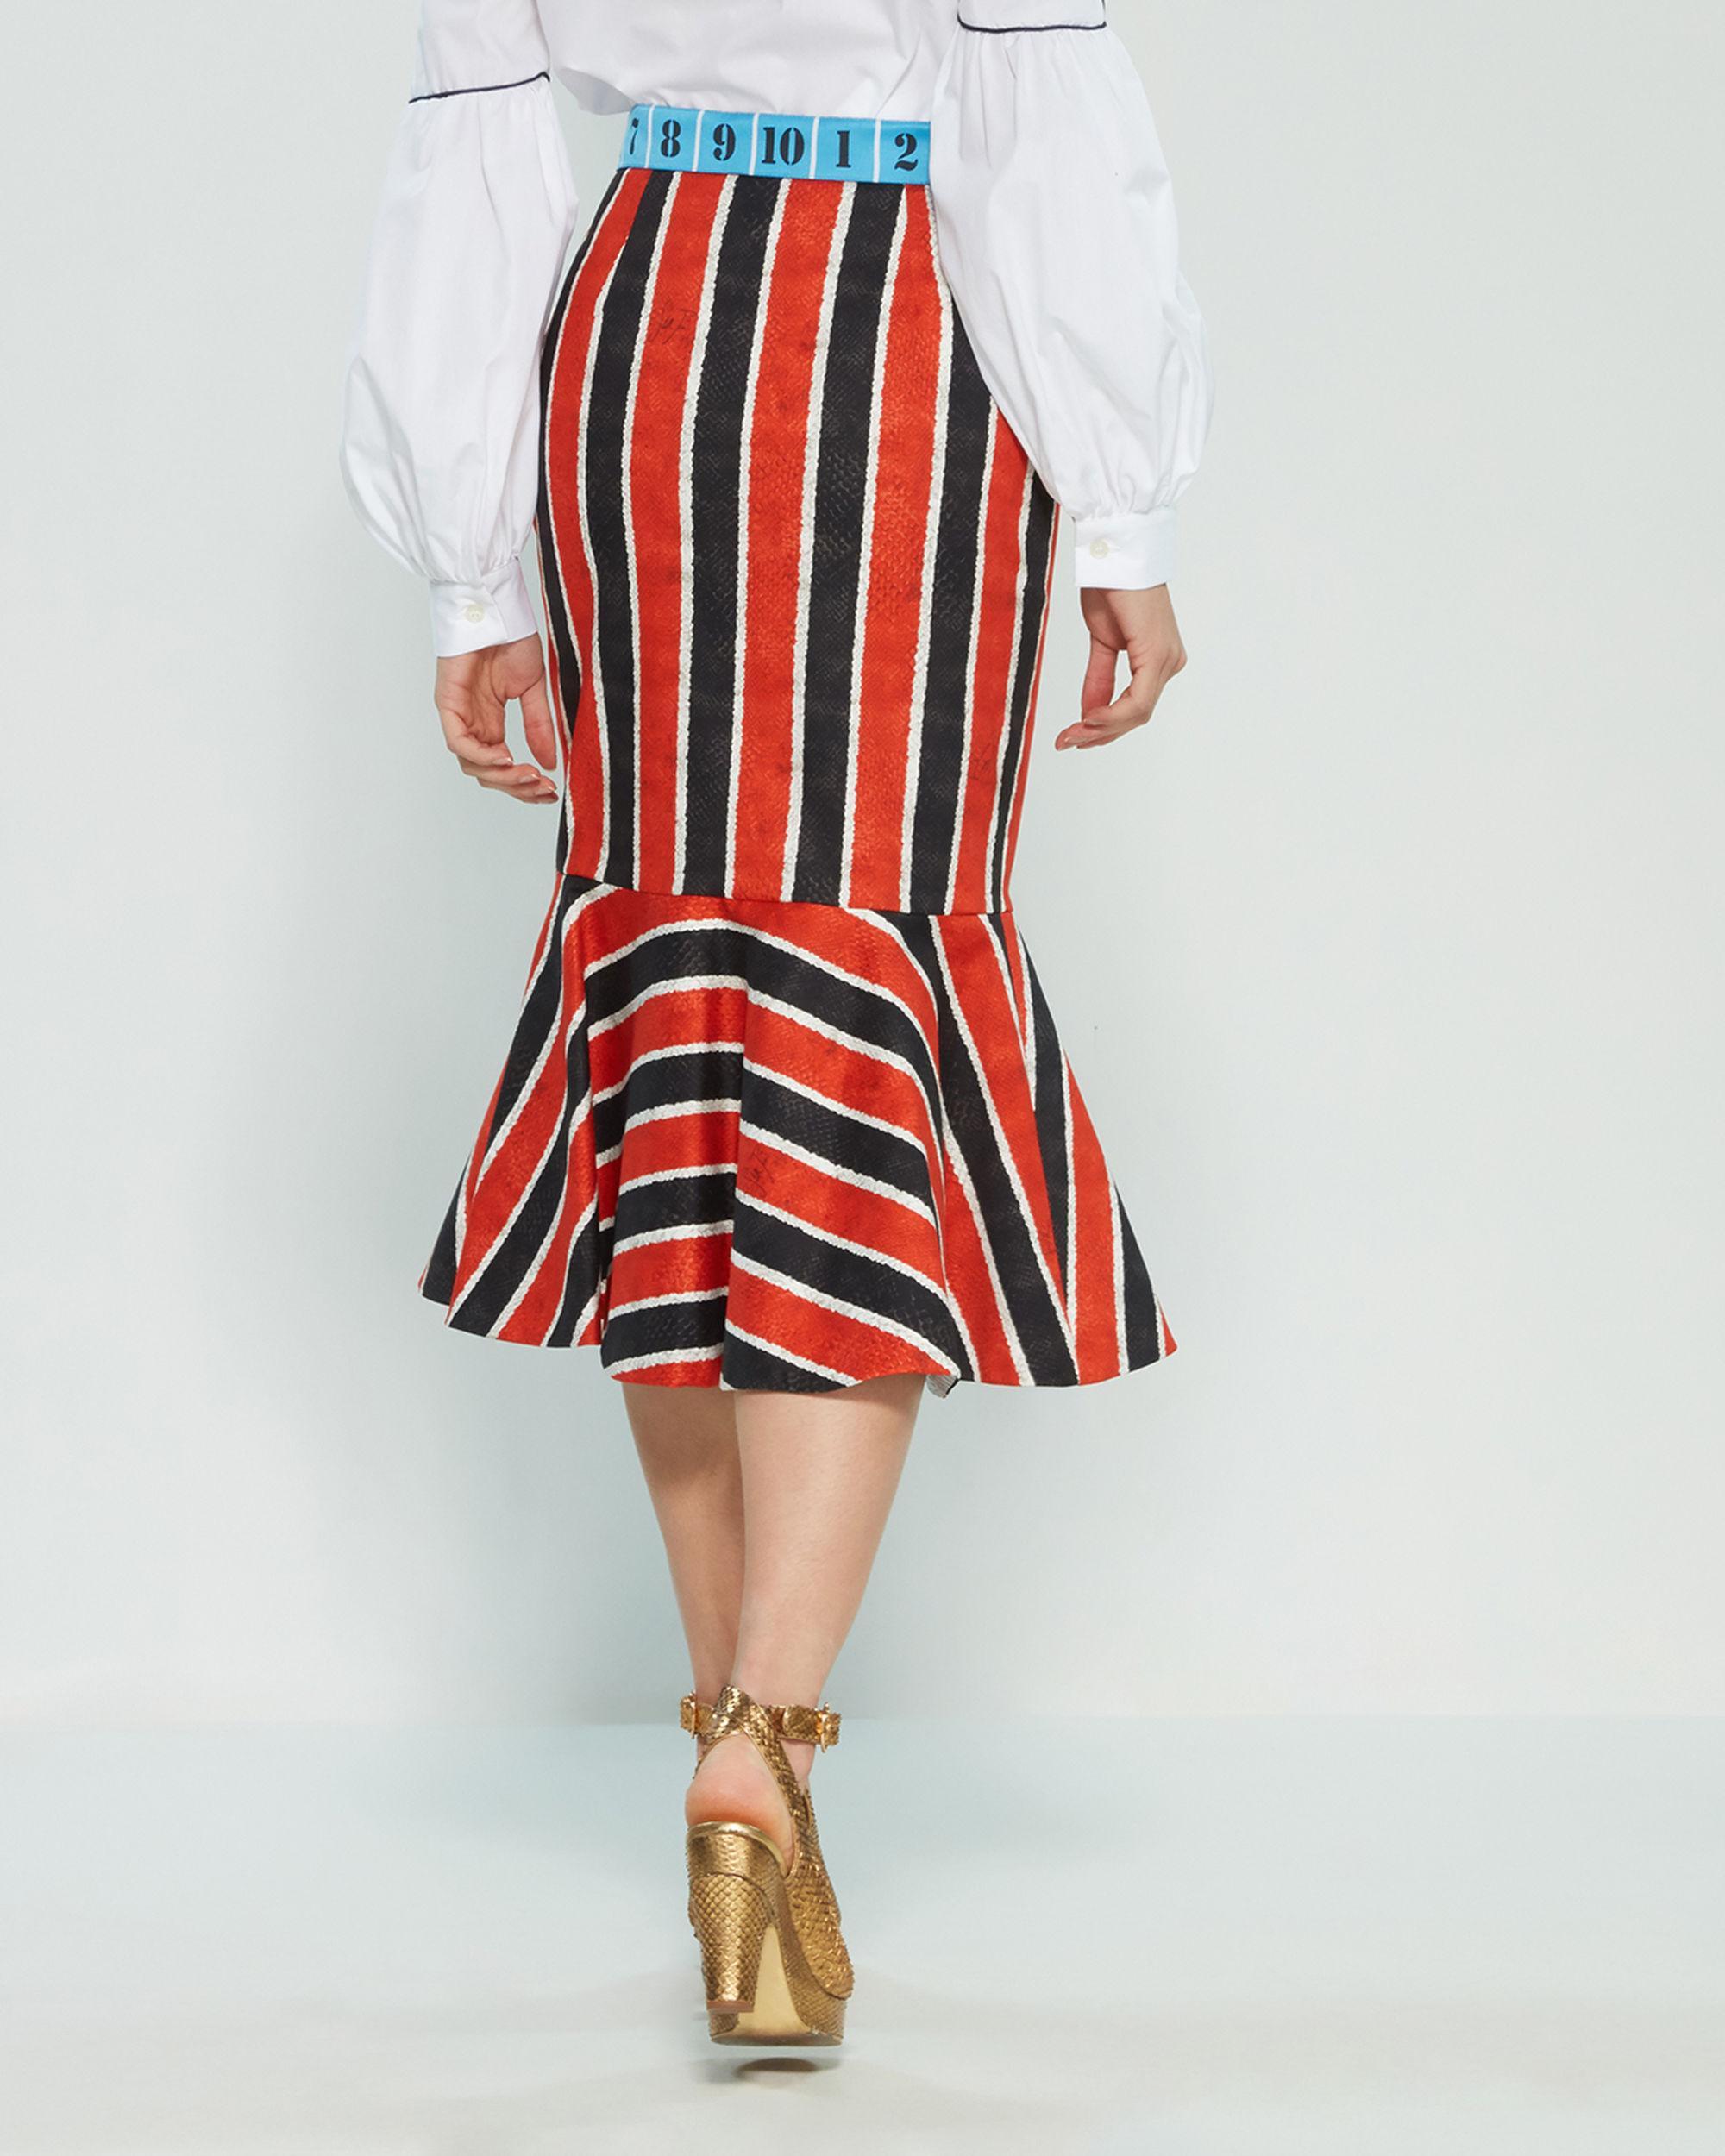 50e5a6b62 Stella Jean Red Striped Snakeskin Print Mermaid Midi Skirt. View fullscreen